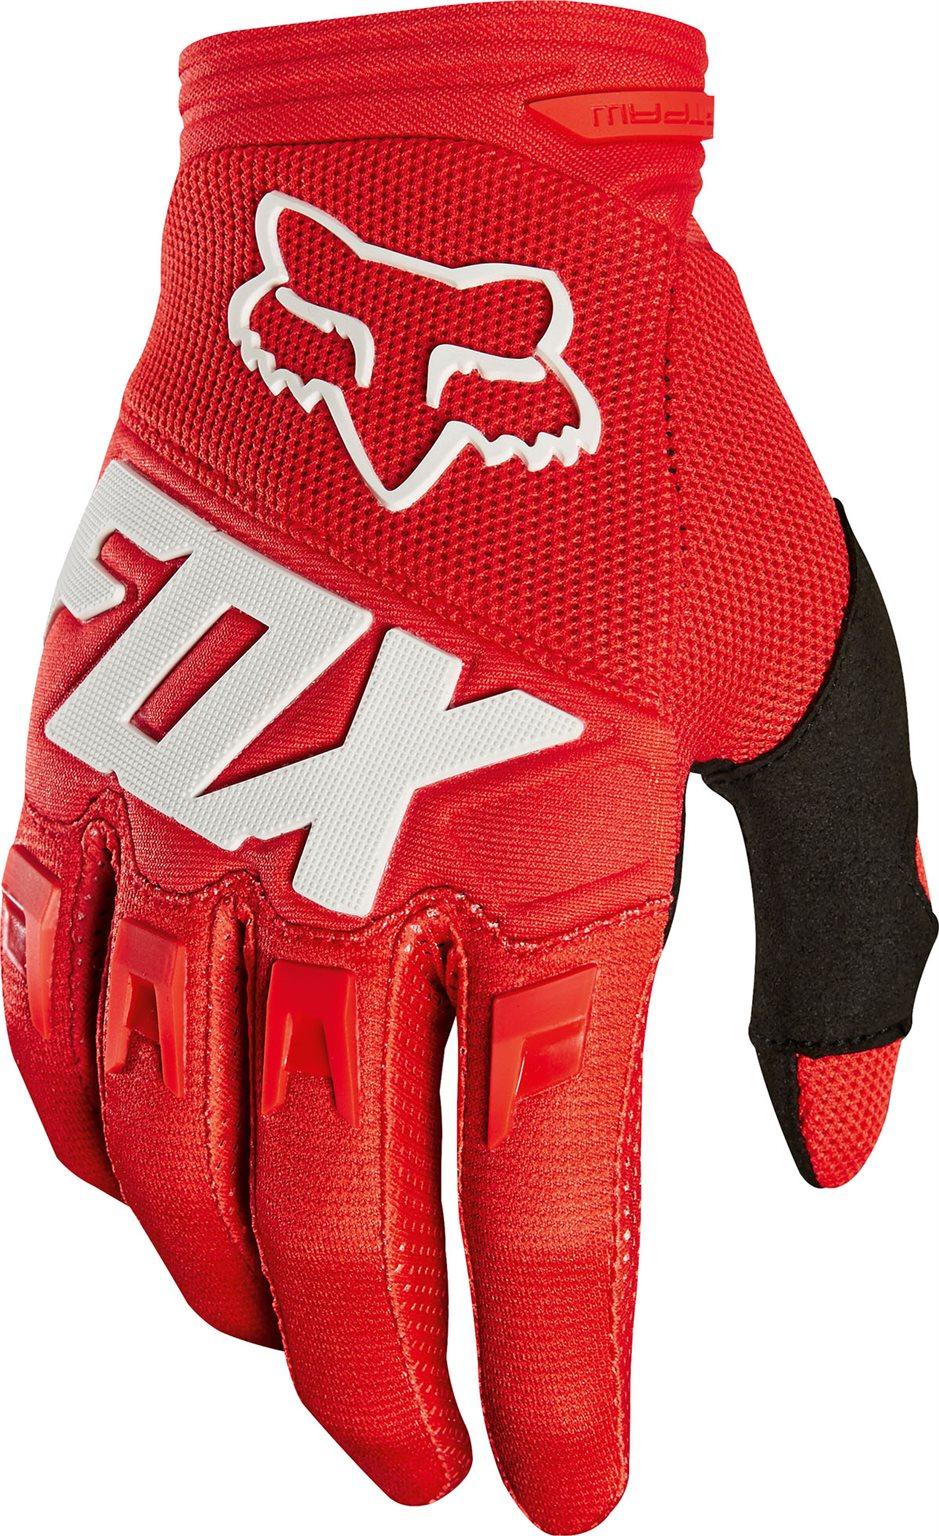 Fox cross kesztyû Dirtpaw Race piros